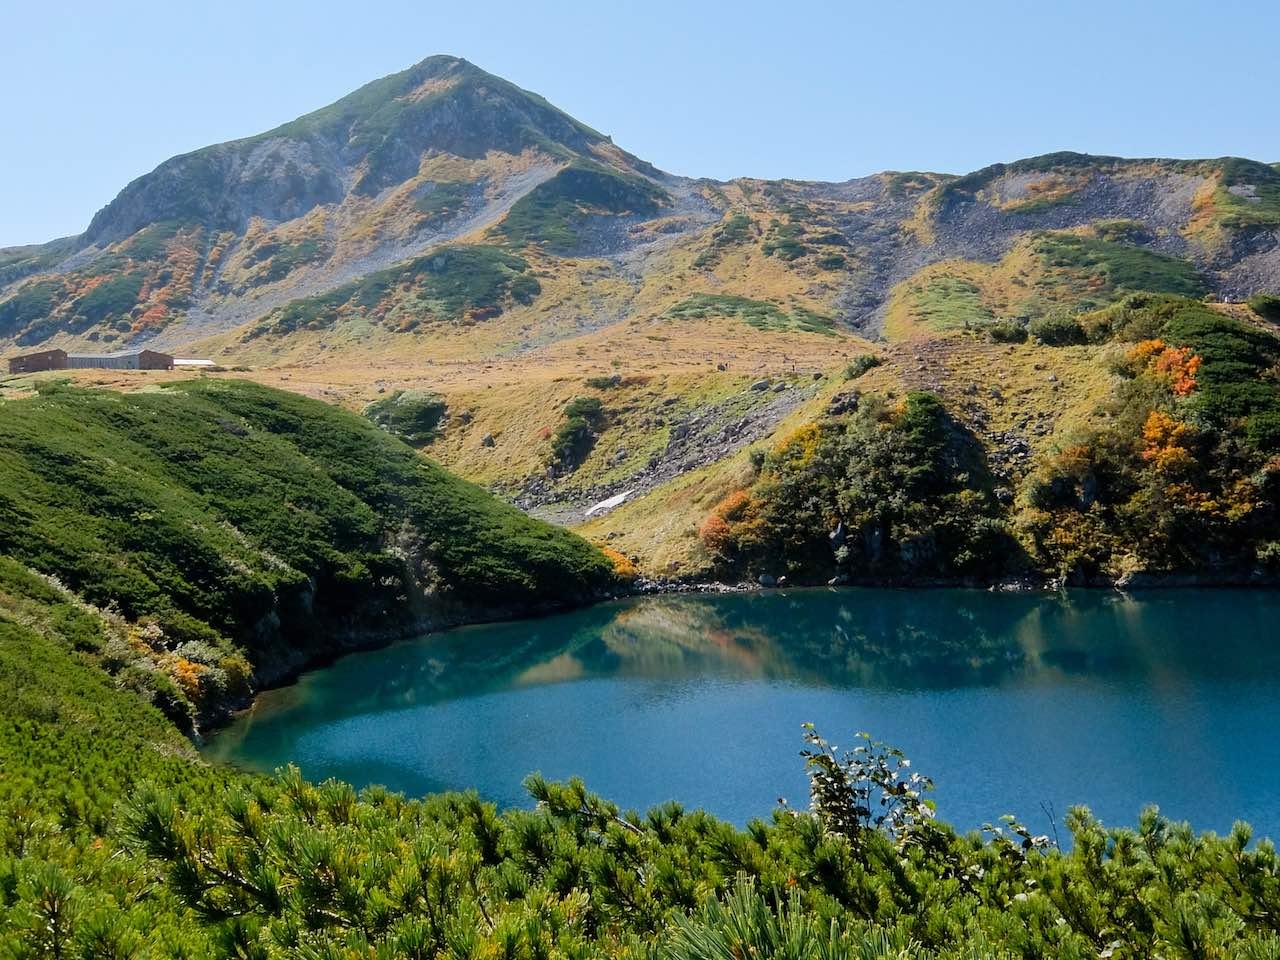 Hiking from Tateyama - Mikurigaike Crater Lake  Hiking from Tateyama across the Northern Japan Alps Hiking from Tateyama Mikurigaike Crater Lake